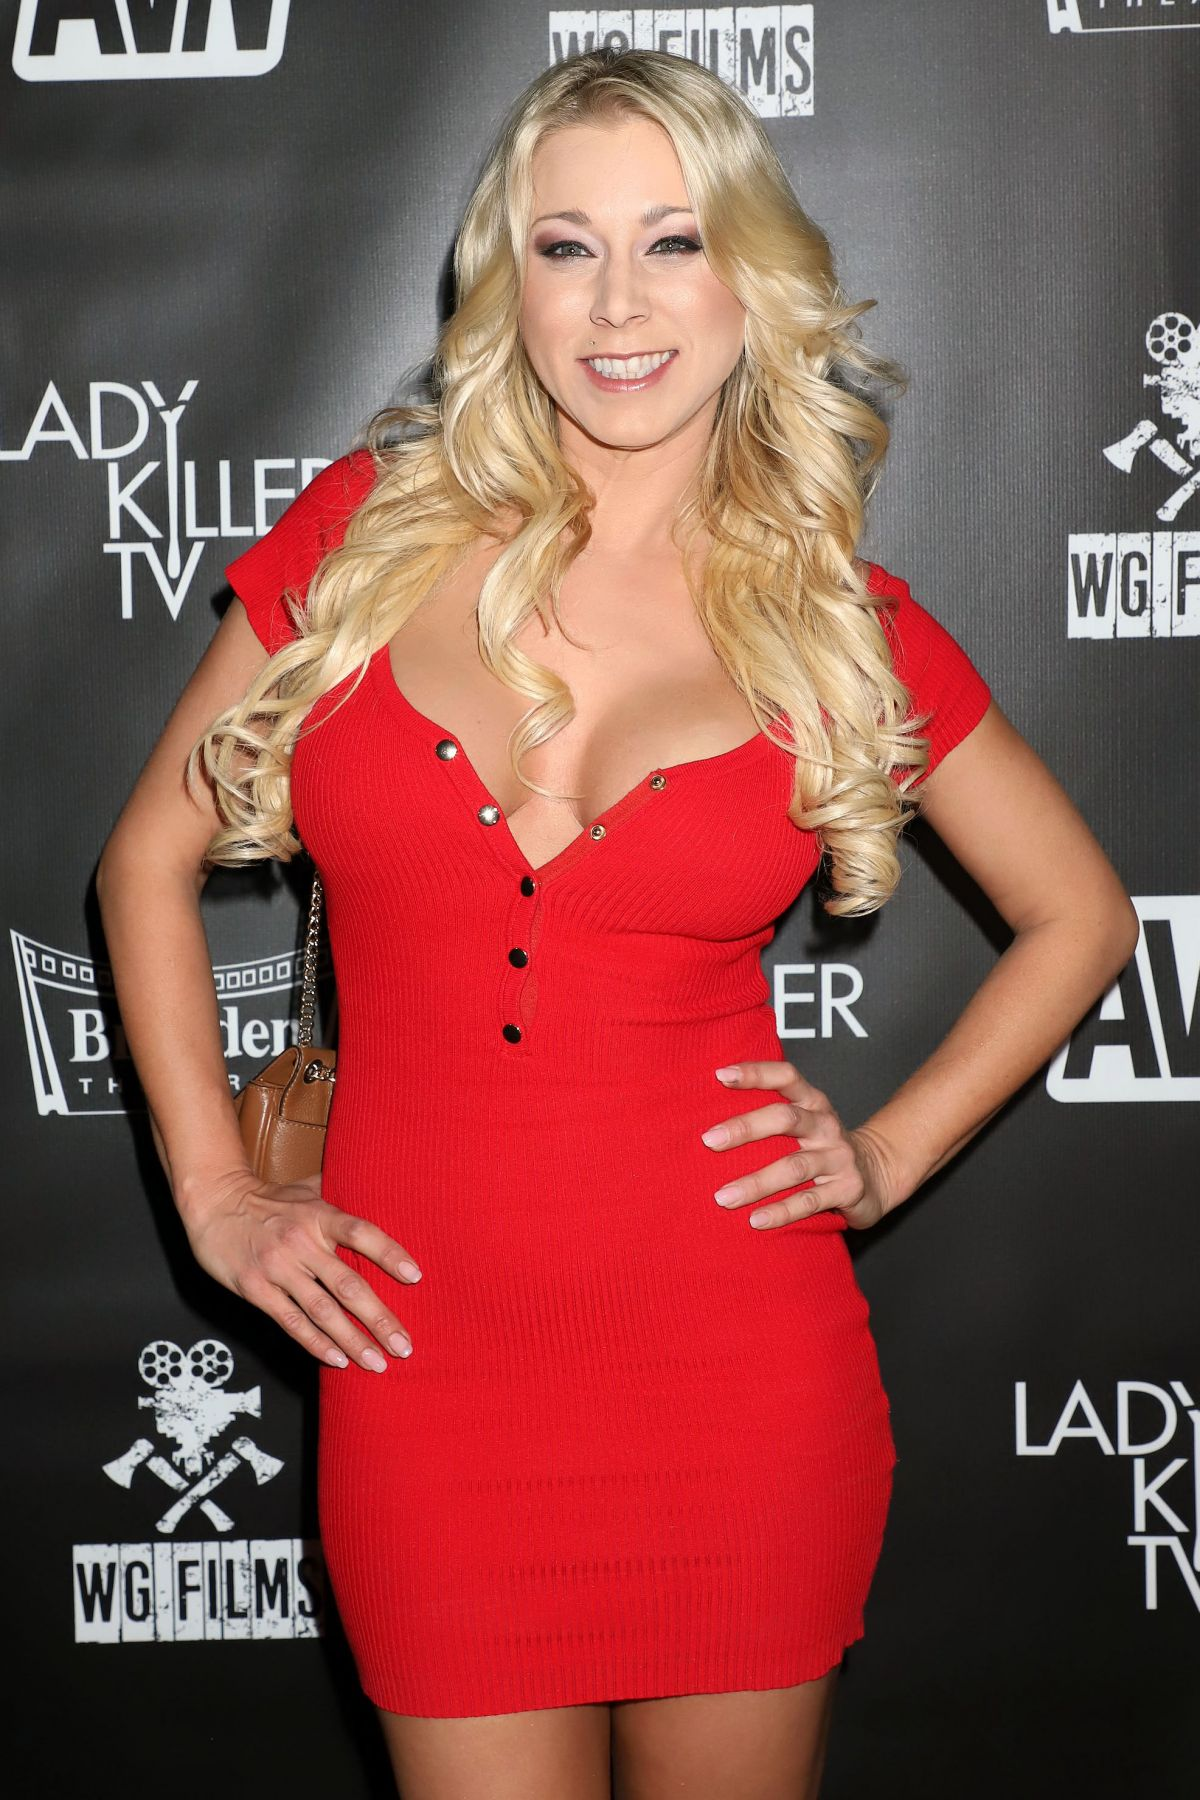 KATIE MORGAN at Ladykiller Premiere in Las Vegas 10/23